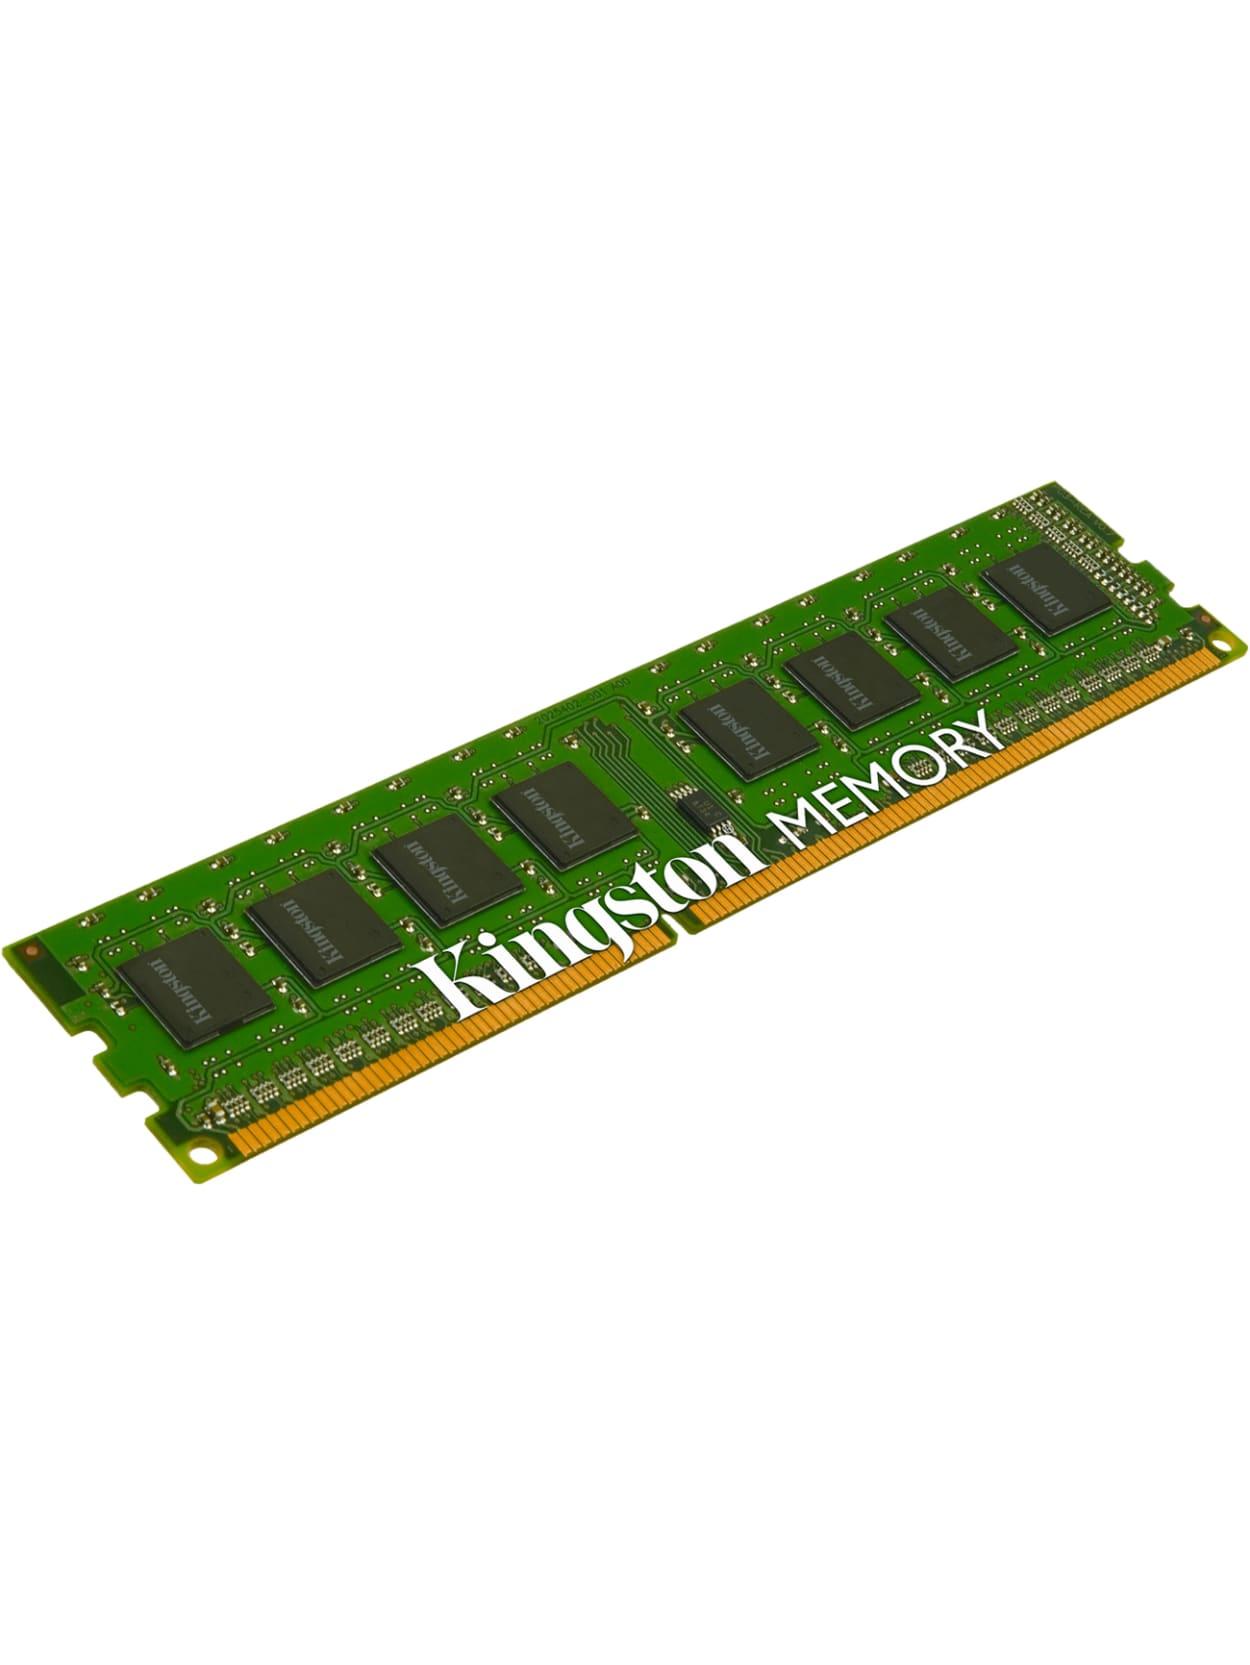 Arch Memory 4 GB 204-Pin DDR3 So-dimm RAM for HP Pavilion Entertainment dv3-4019tx